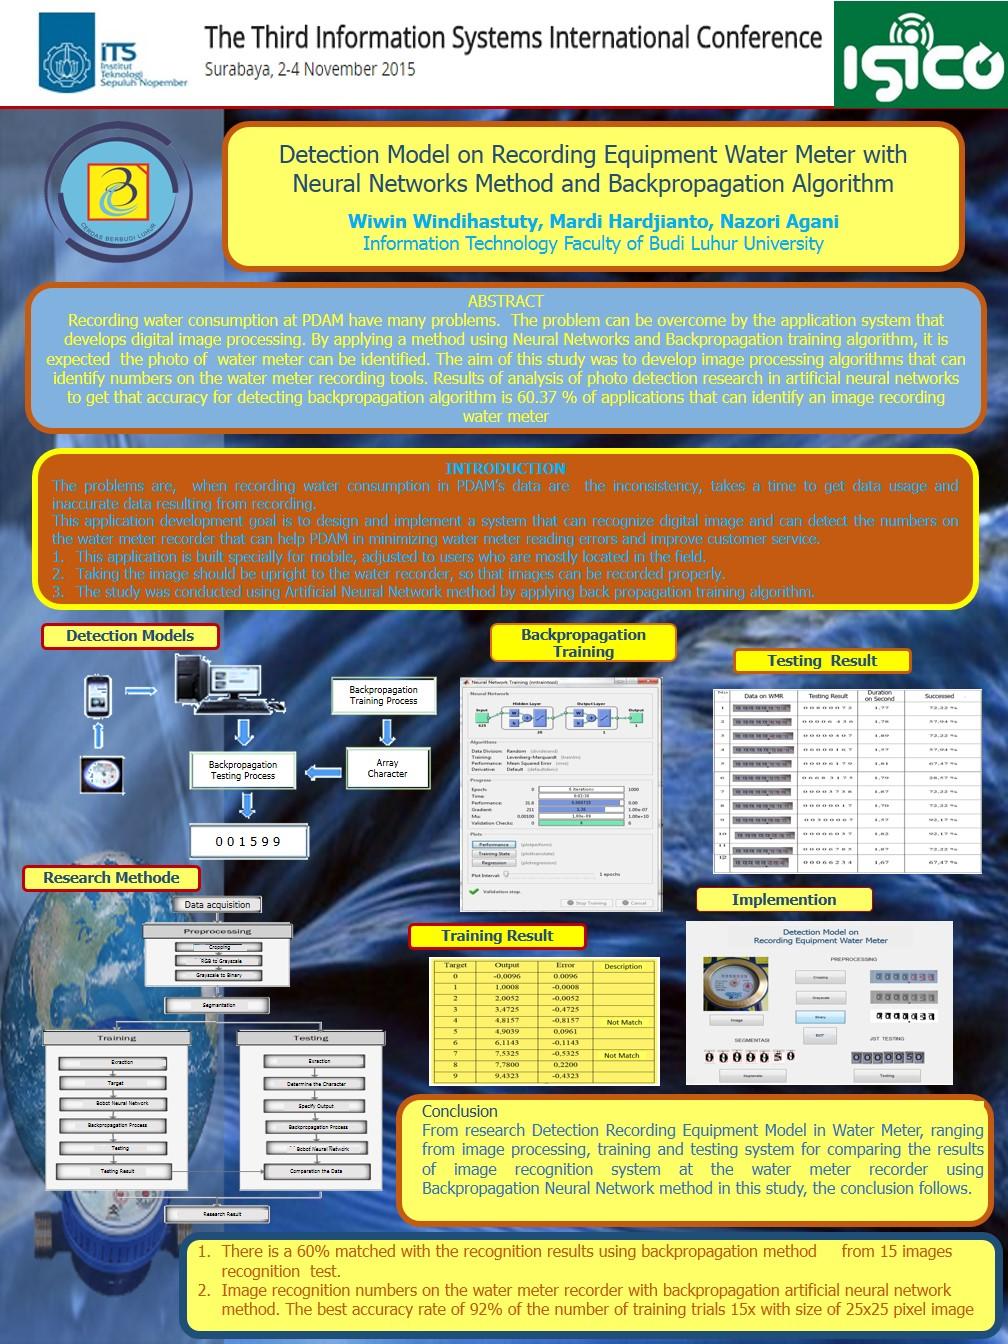 Contoh Makalah Gizi Lengkap Format .doc .docx Microsoft Word